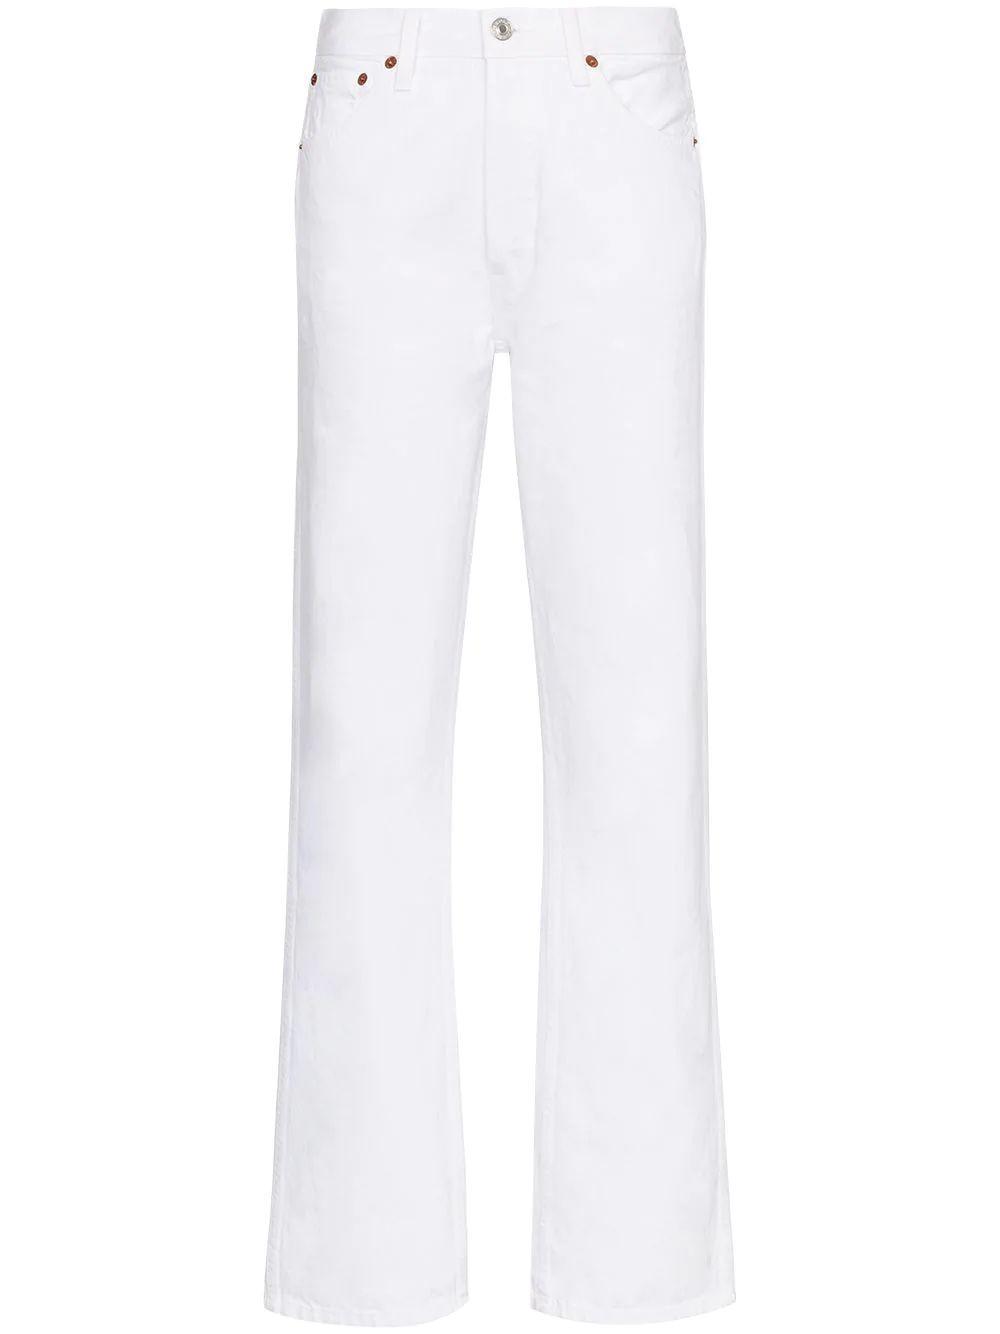 90s High Rise Straight Leg Jeans Item # 184-3WHRL